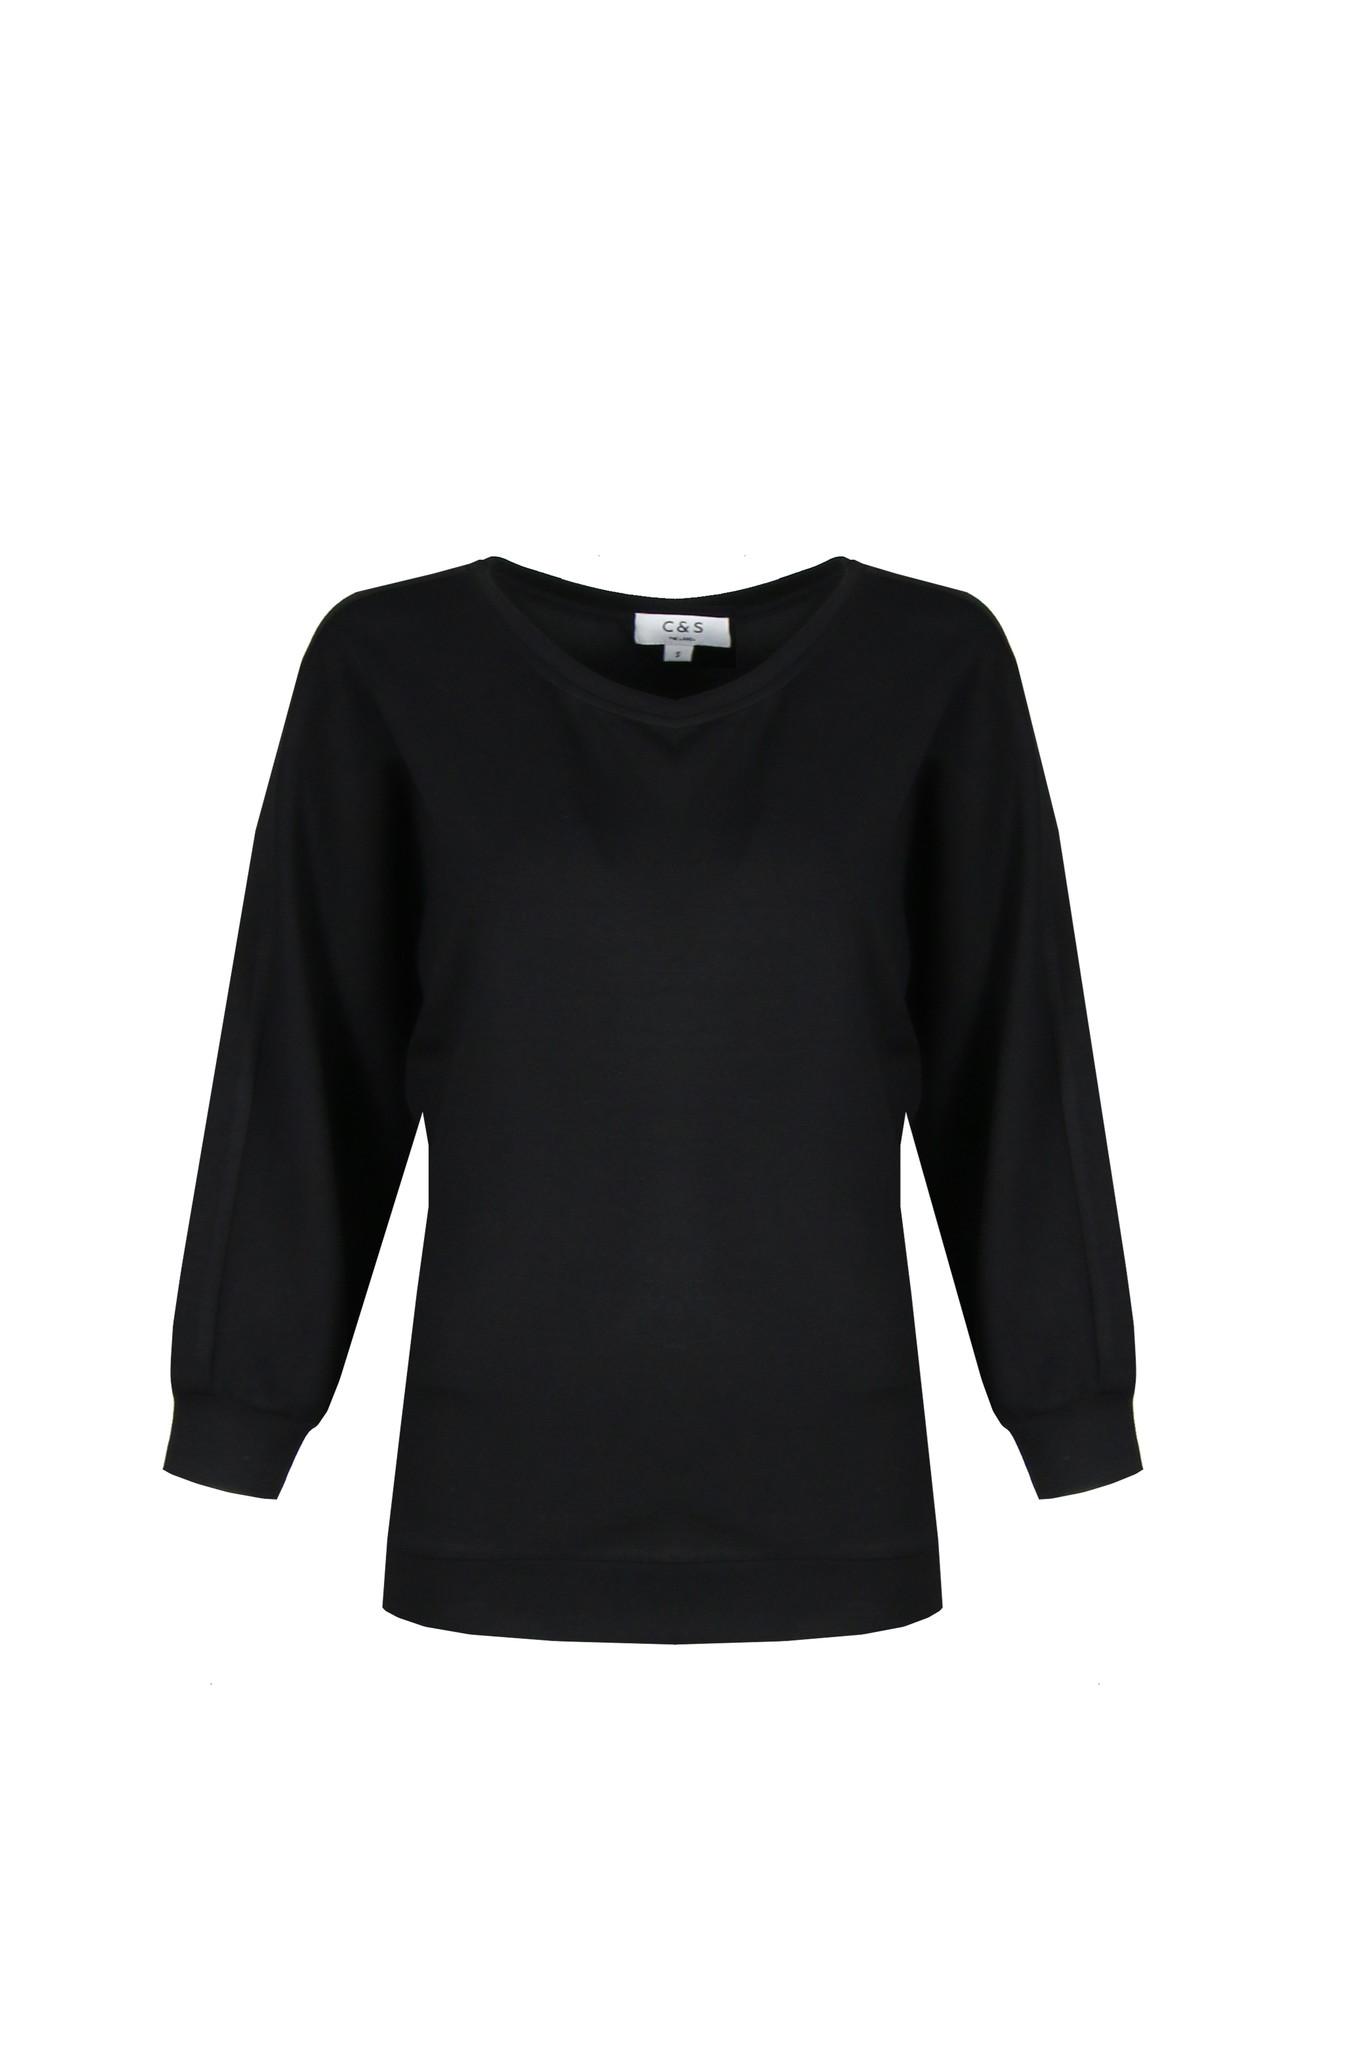 C&S The label C&S The Label June sweater zwart